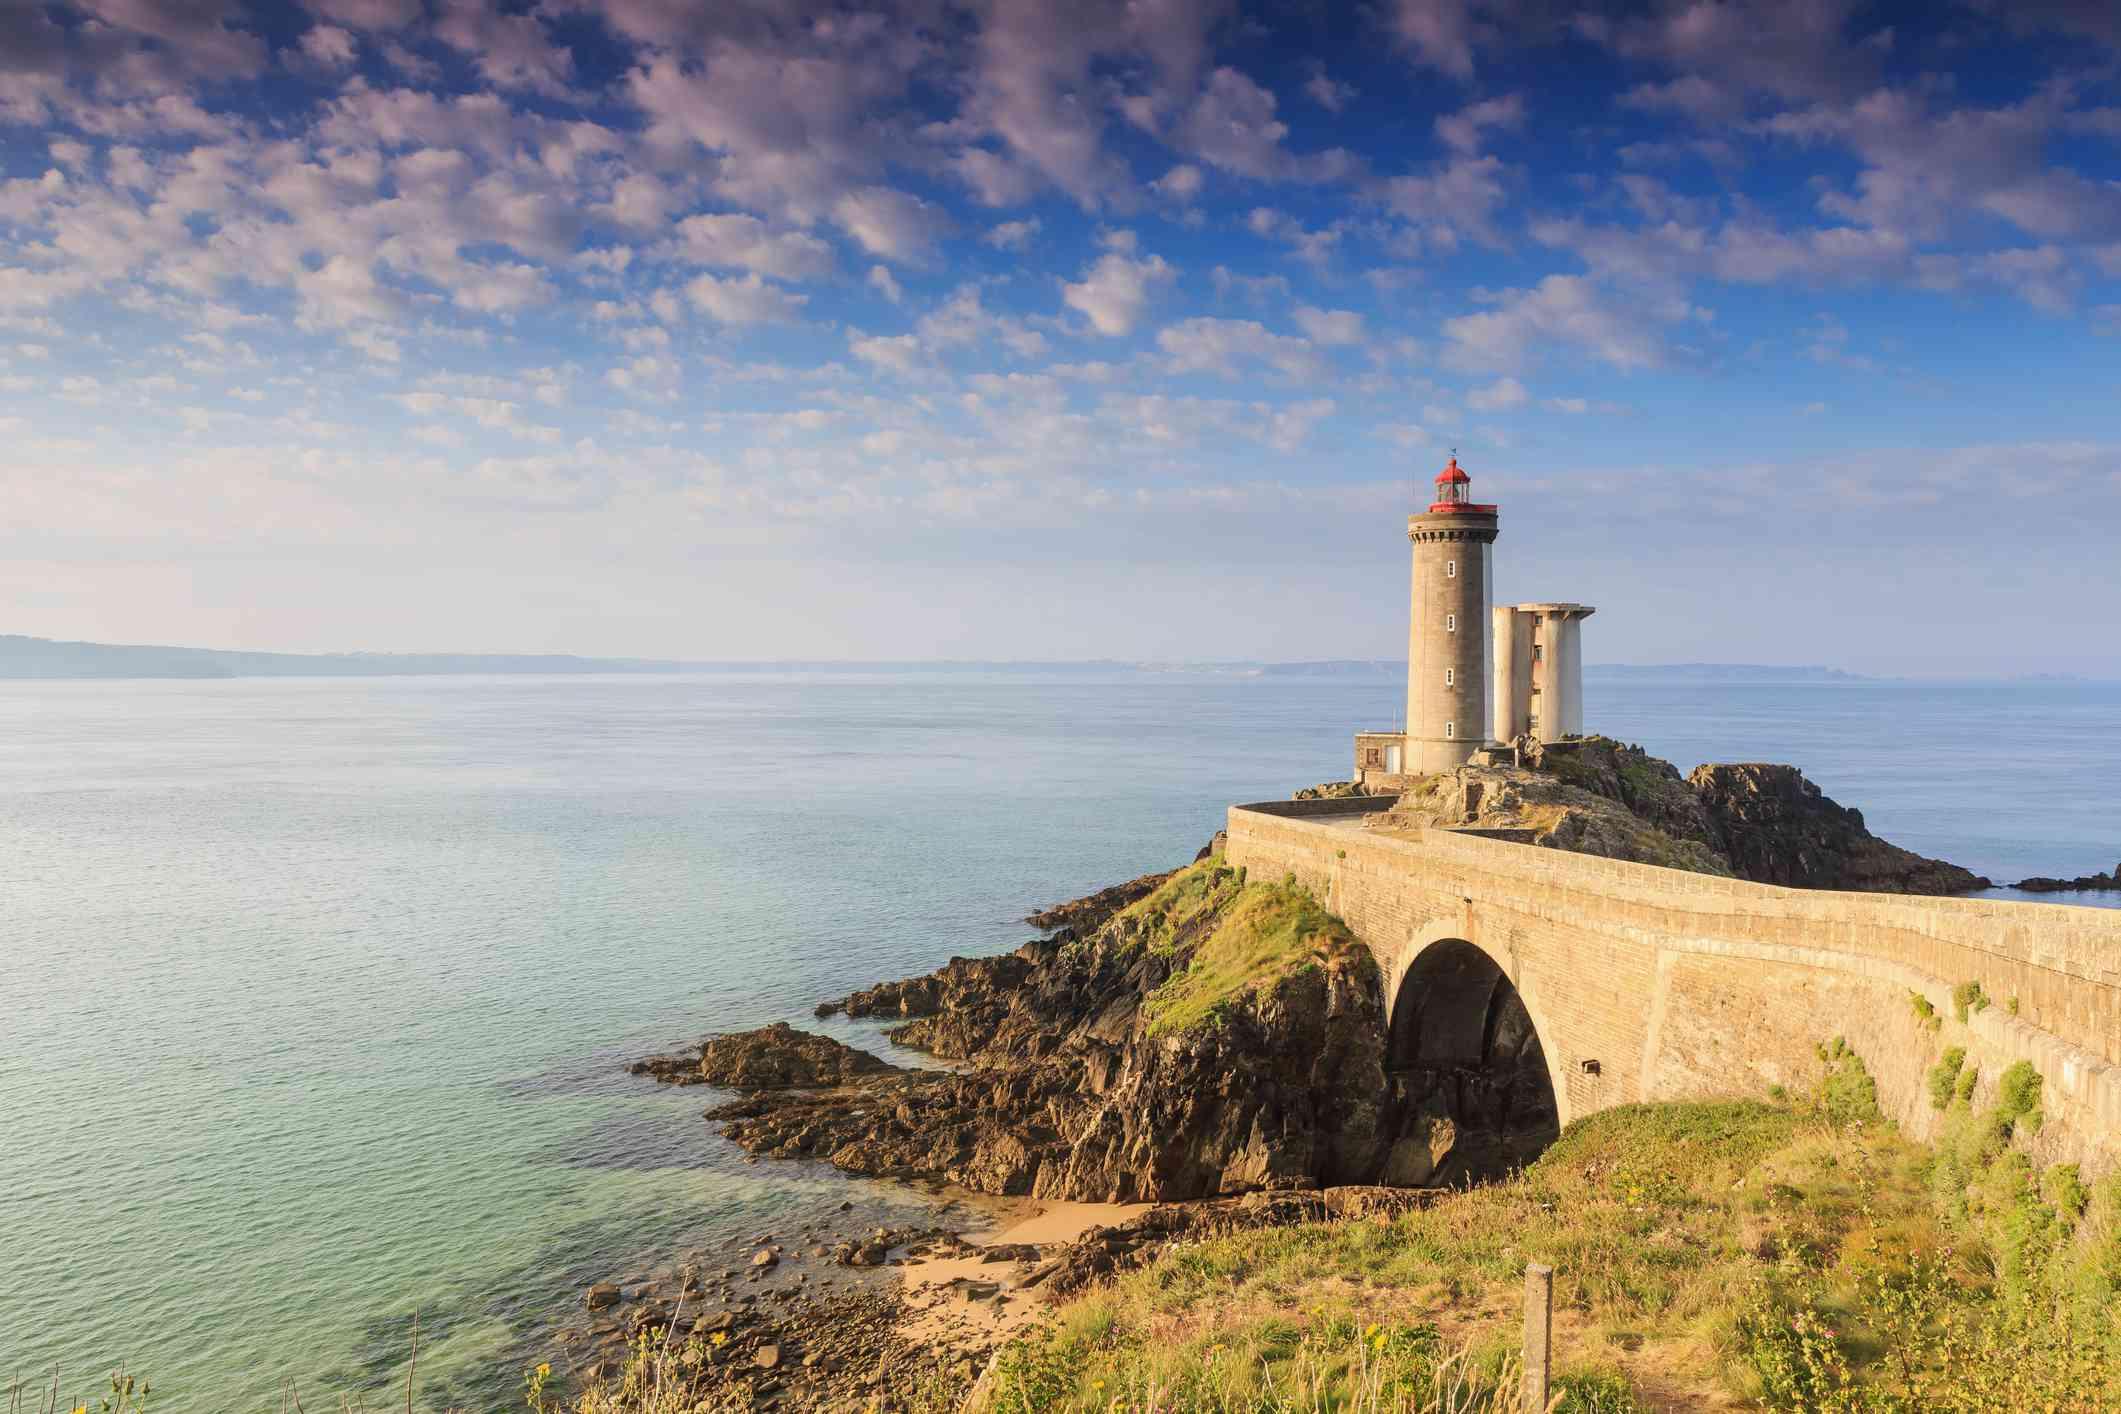 Minou Lighthouse in Finistère, Brittany, France